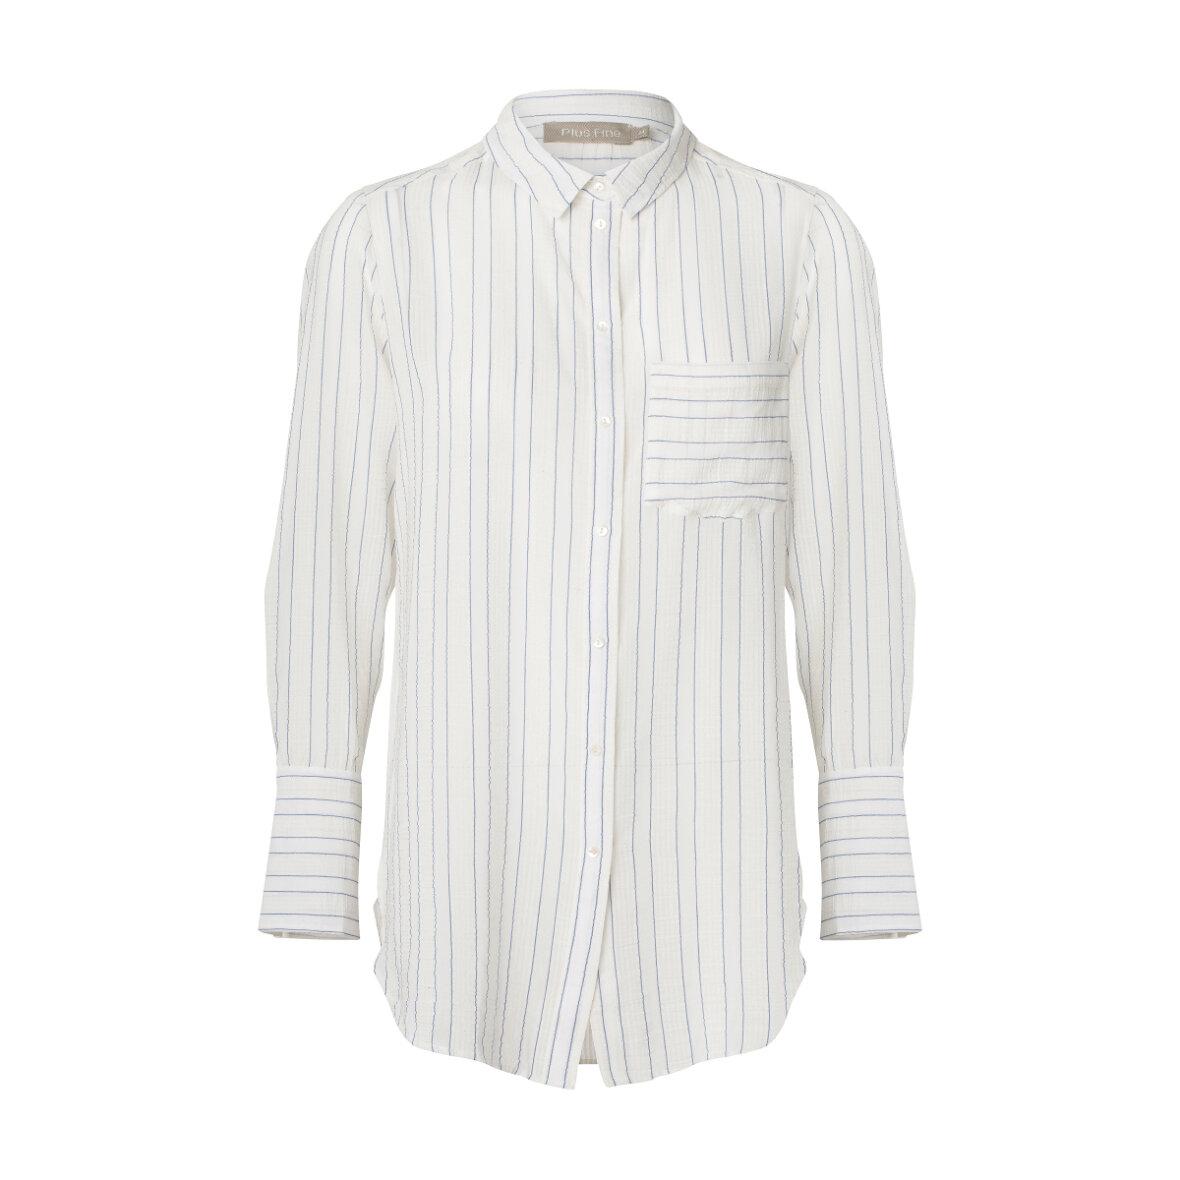 26016e277ea6 New York Aabenraa Skjorte D - Fine Cph - Plus Fine Skjorte Larish